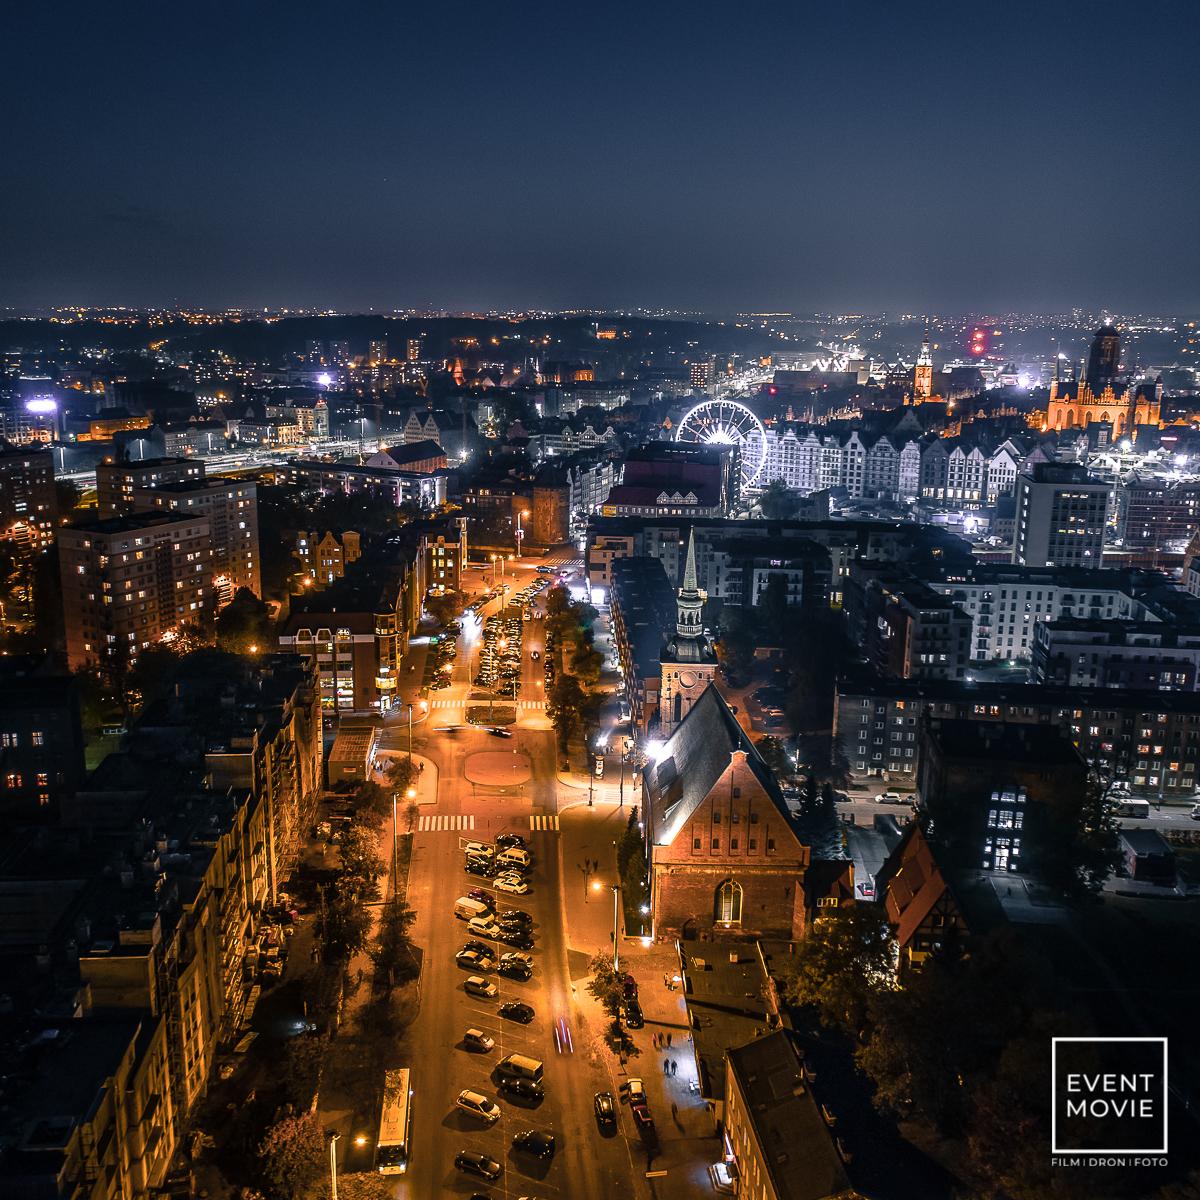 film reklamowy Gdańsk, film promocyjny Trójmiasto - Eventmovie